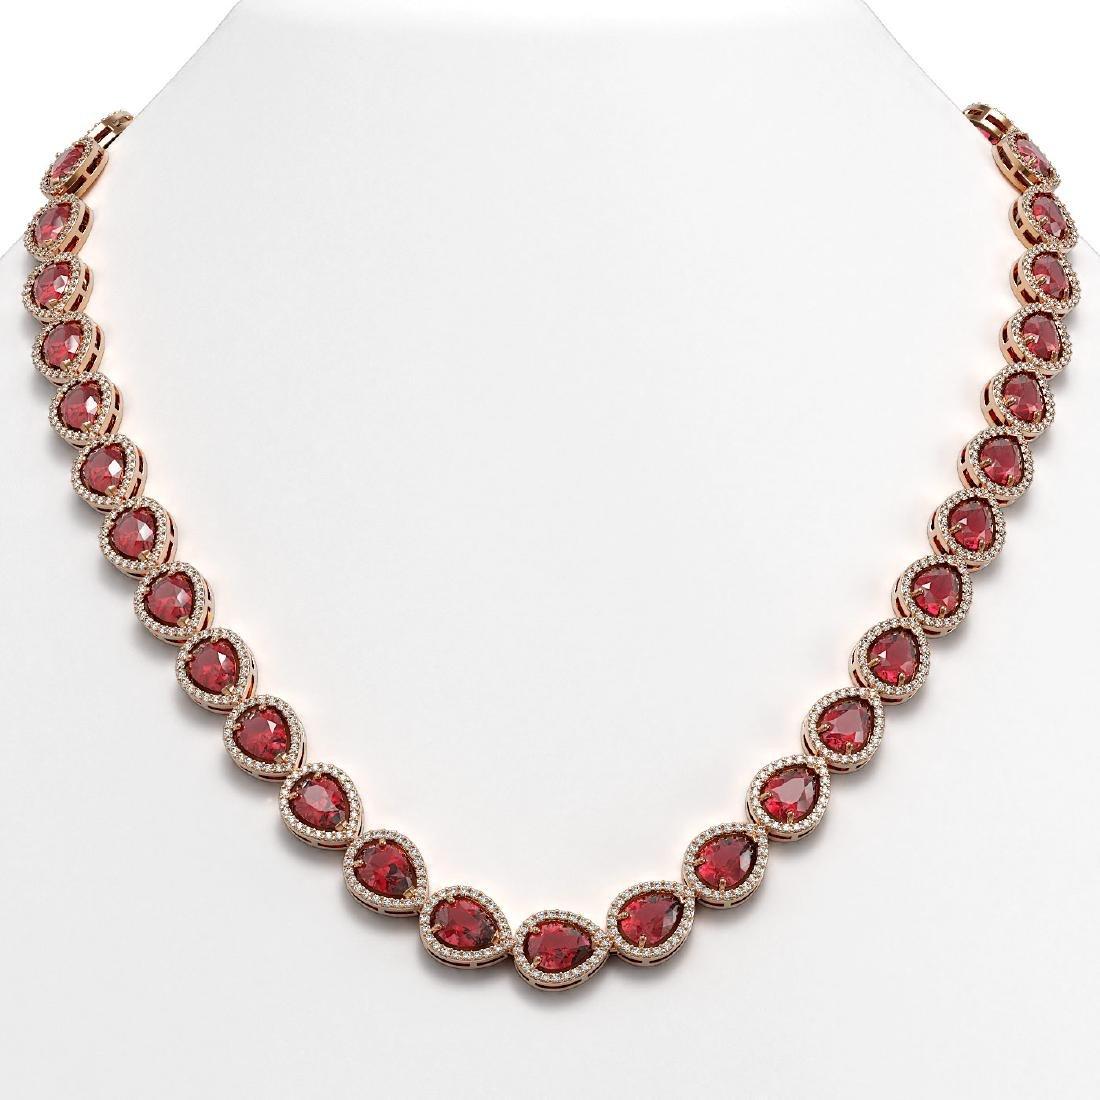 35.13 CTW Tourmaline & Diamond Halo Necklace 10K Rose